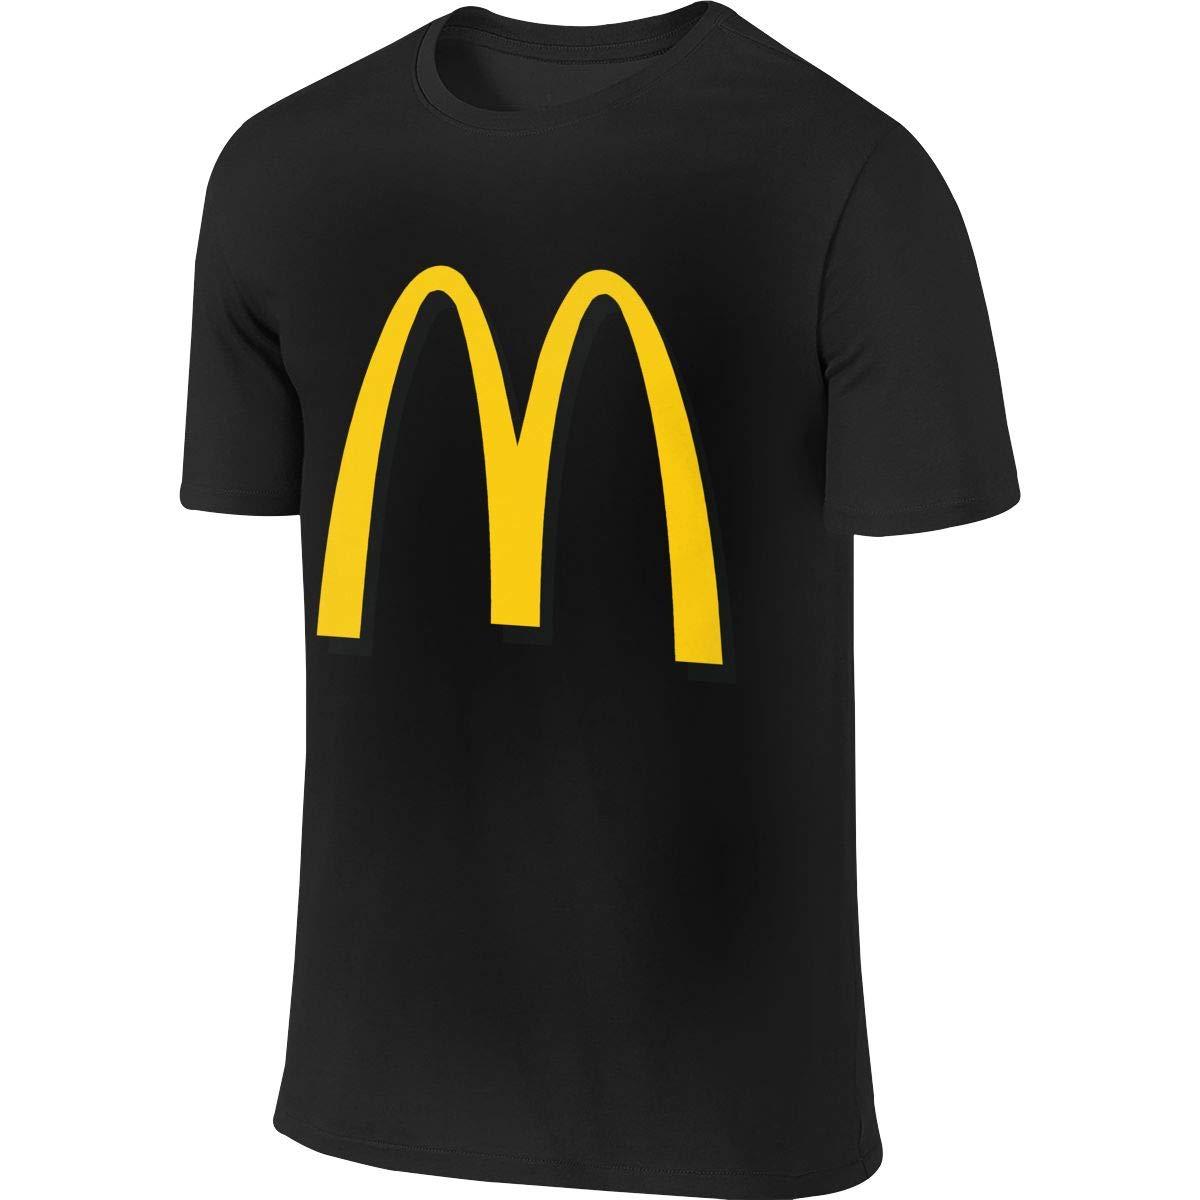 Men's Youth Boys McDonalds Logo T Shirt T-Shirt Summer Short-Sleeve Round Neck Shirts Cotton Sport Tops S Black